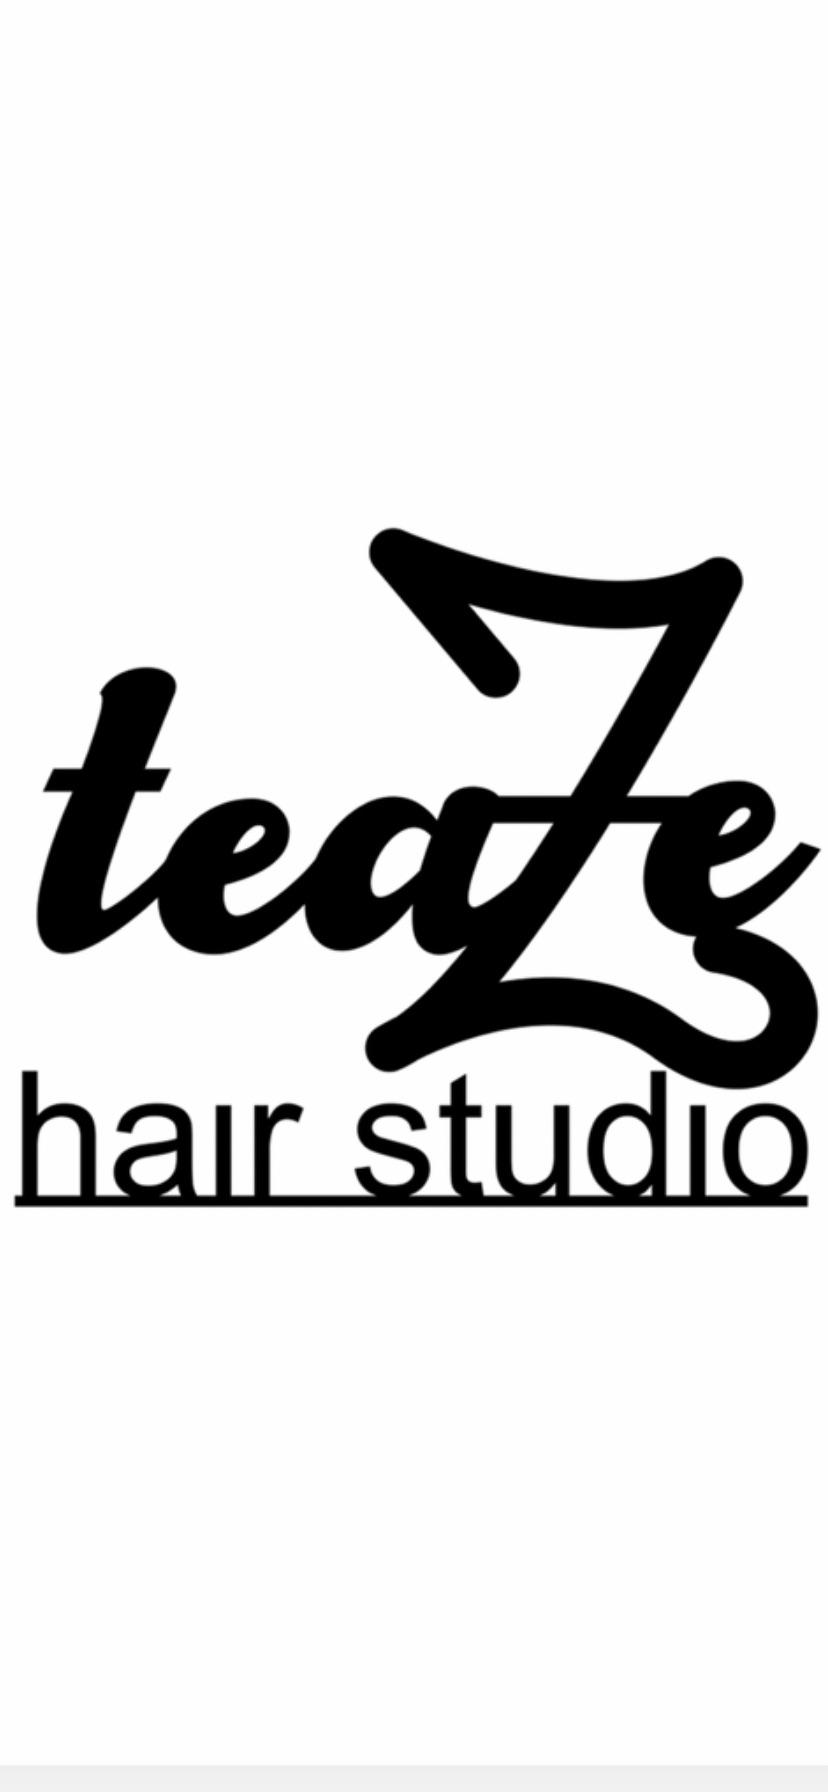 teaZe hair studio